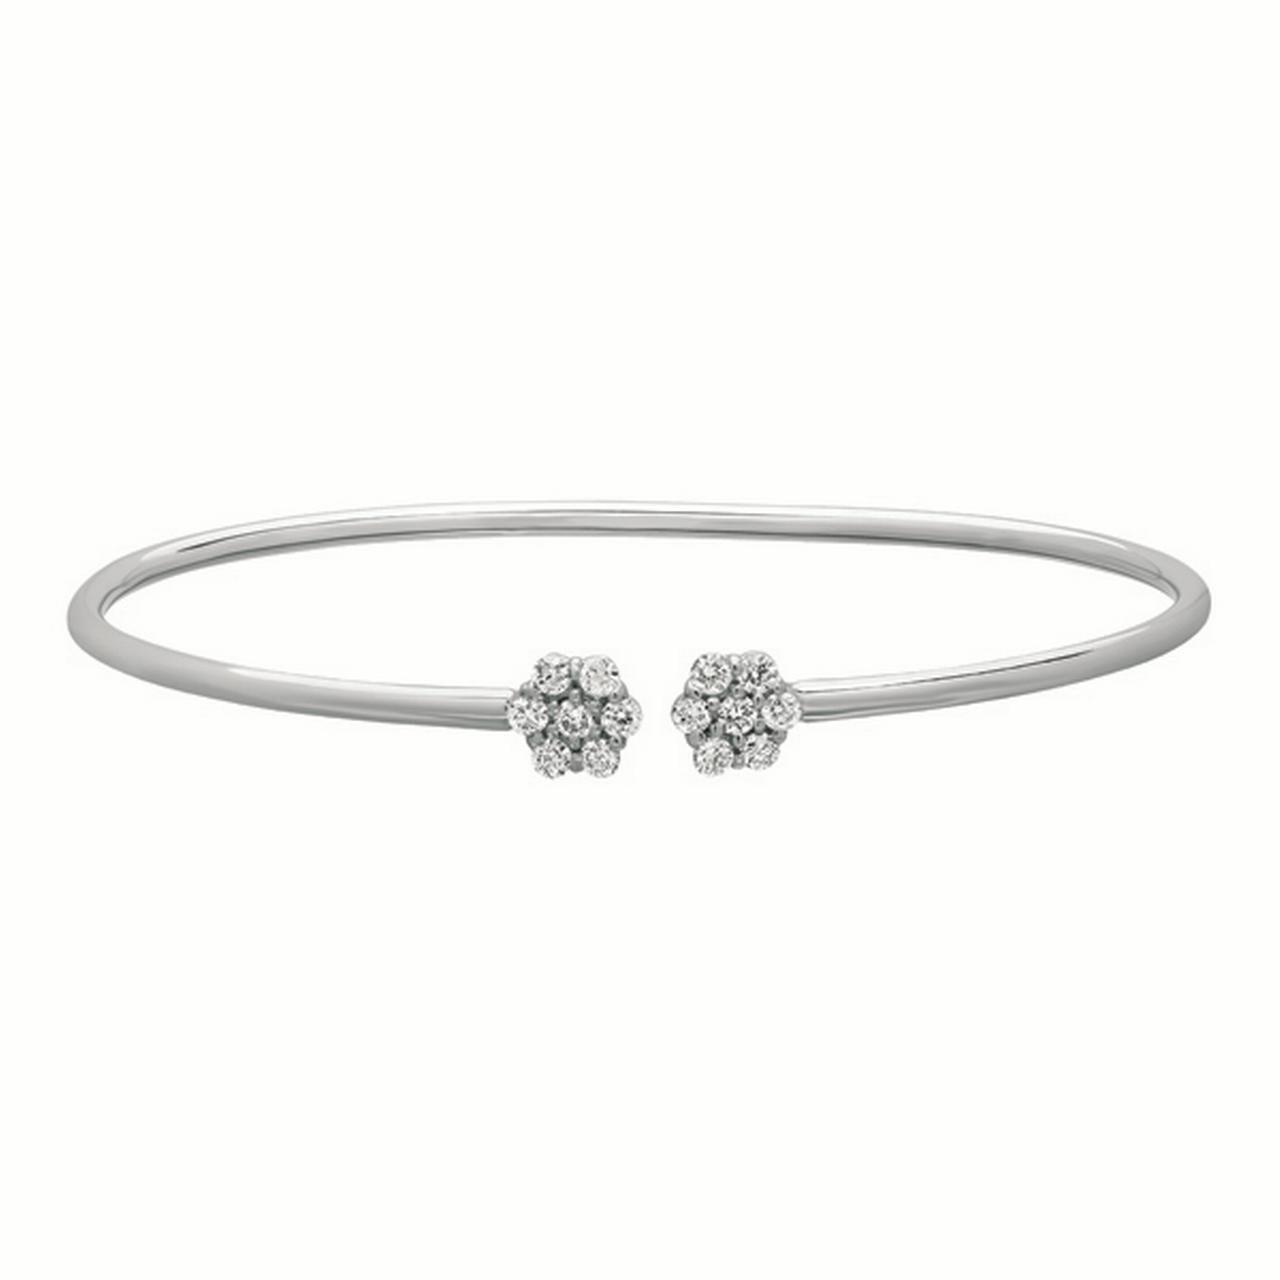 Diamond Jewelry, Cluster Flower Tip Cuff Bracelet, 14 Karat White Gold, Diamond 0.52 Carats, 7 Inches Around, Open Cuff... by Diamond Jewelry